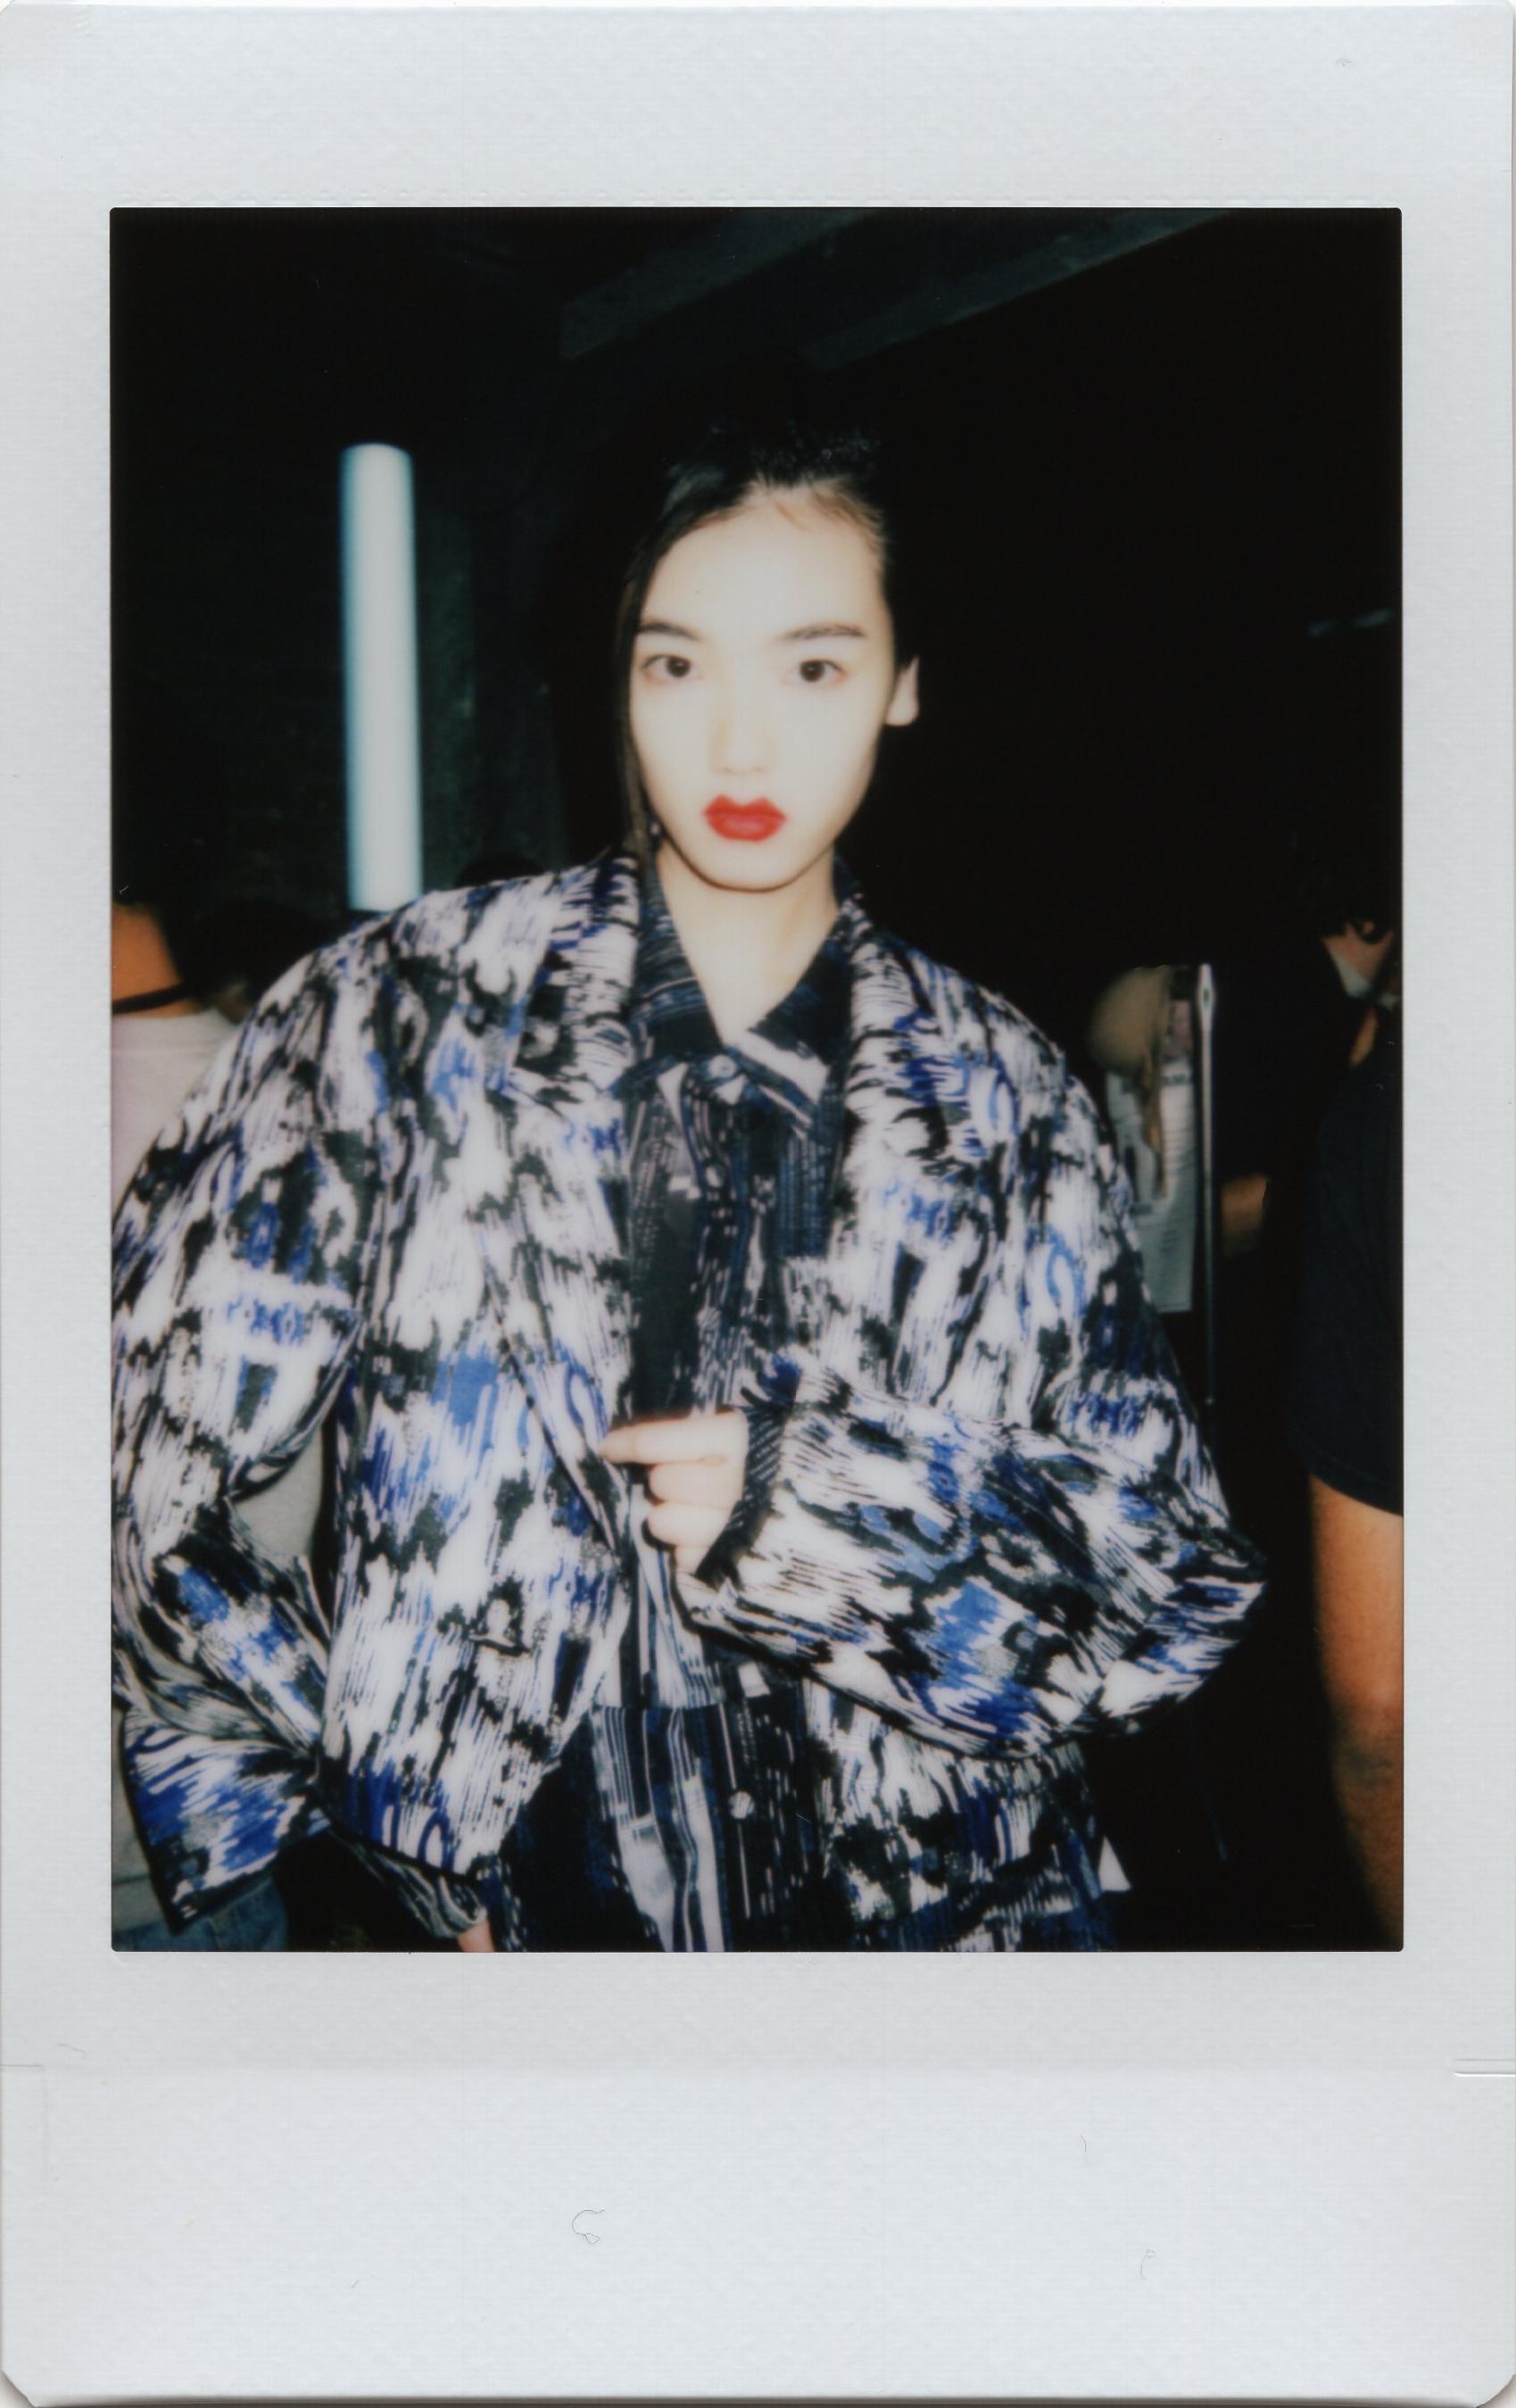 Mashama_Honigschreck_Backstage_Polaroid_8.jpg